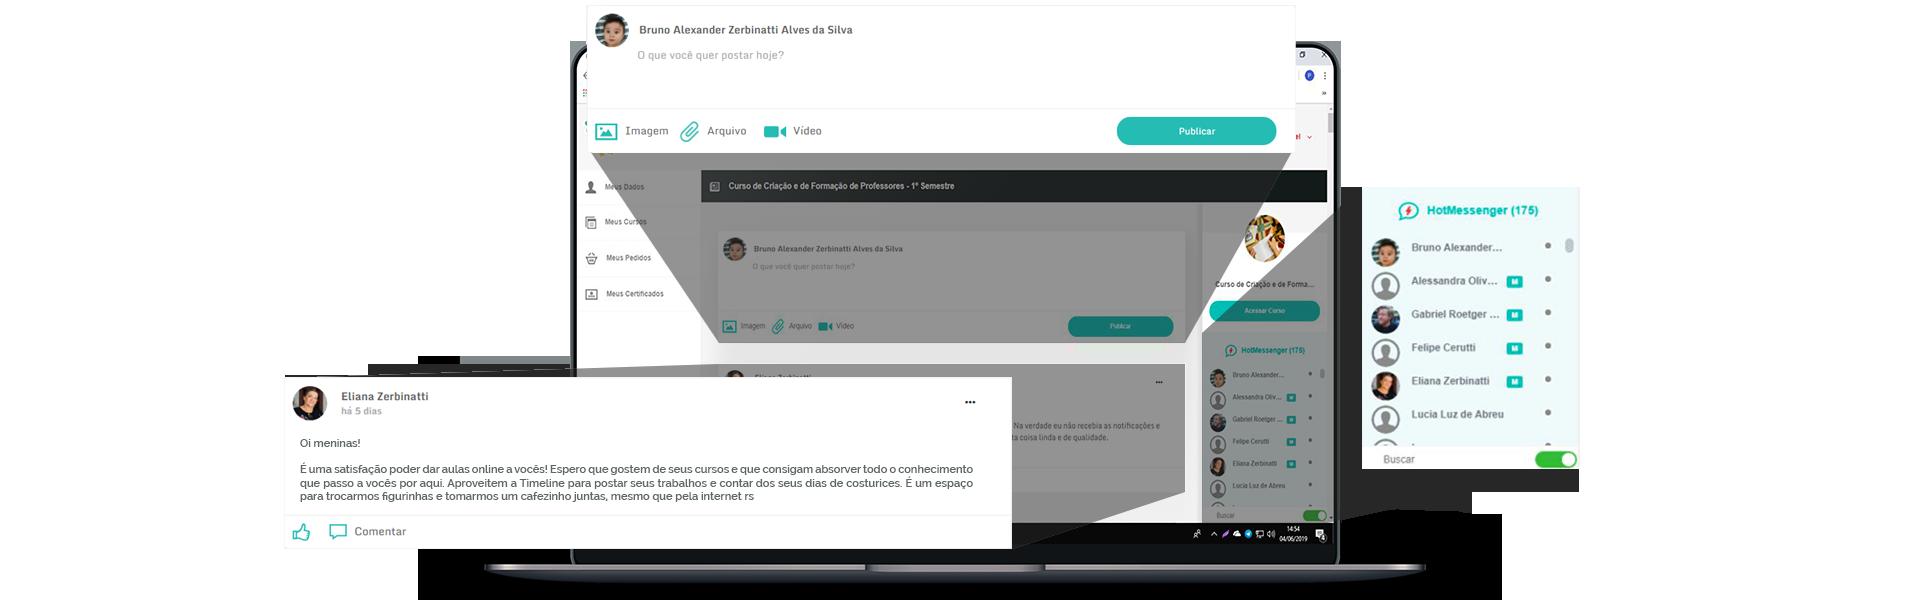 Ambiente desktop de aprendizagem social da Hotscool